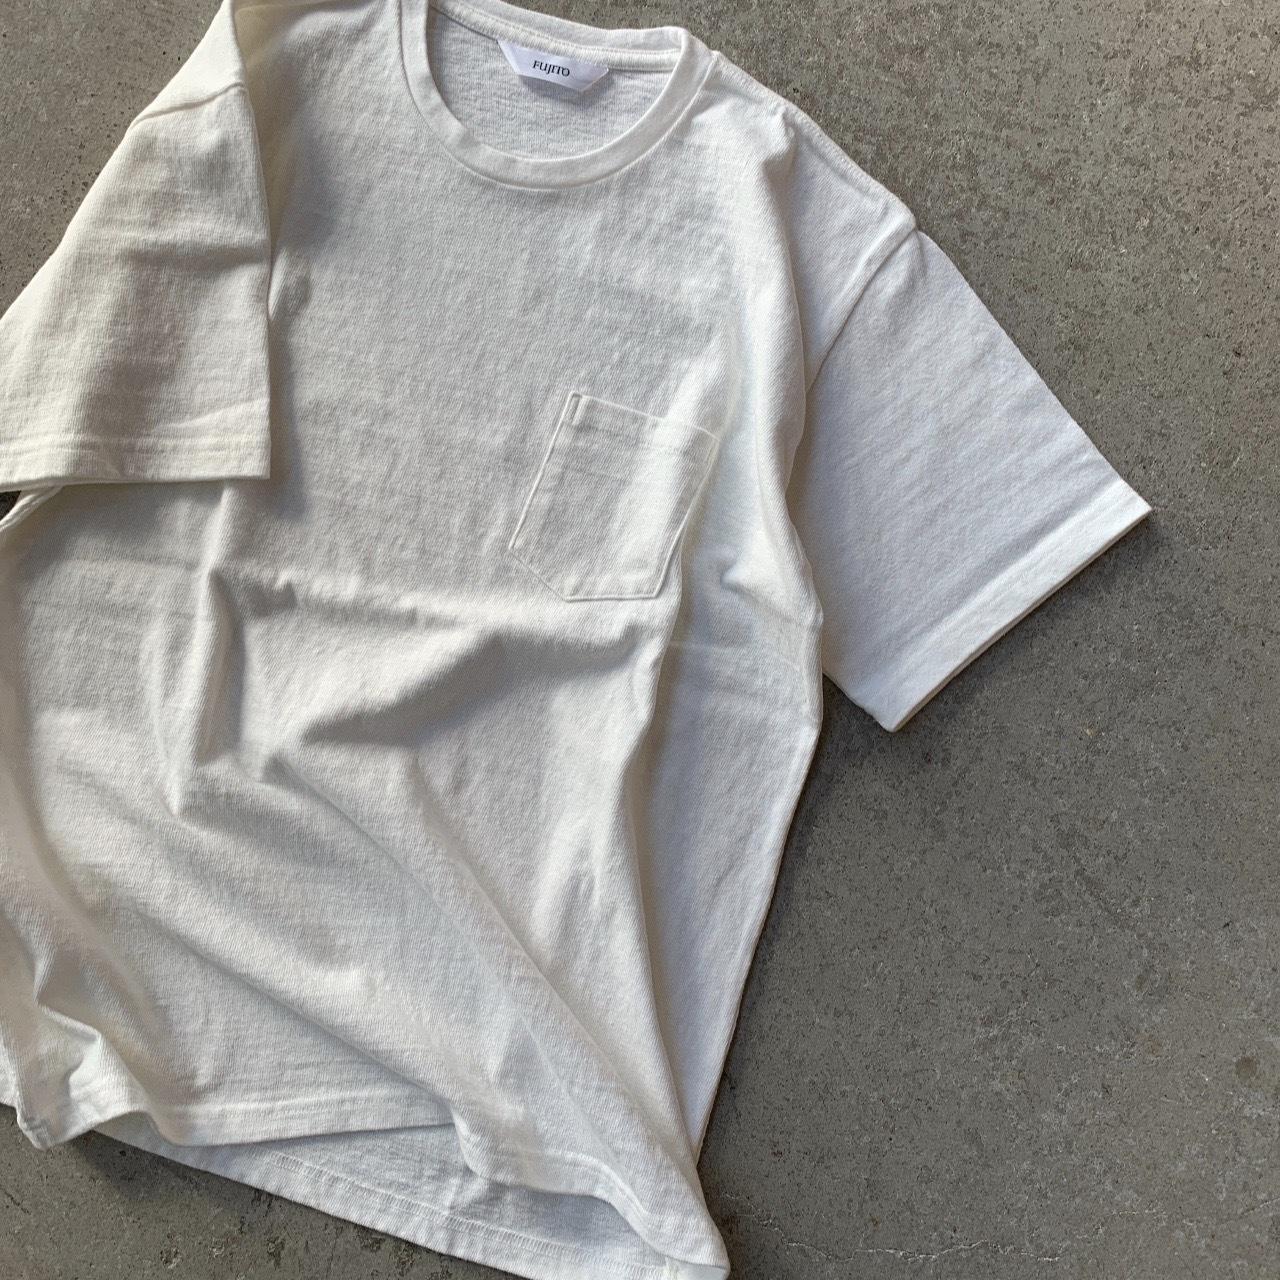 FUJITO - C/N Pocket T-Shirt